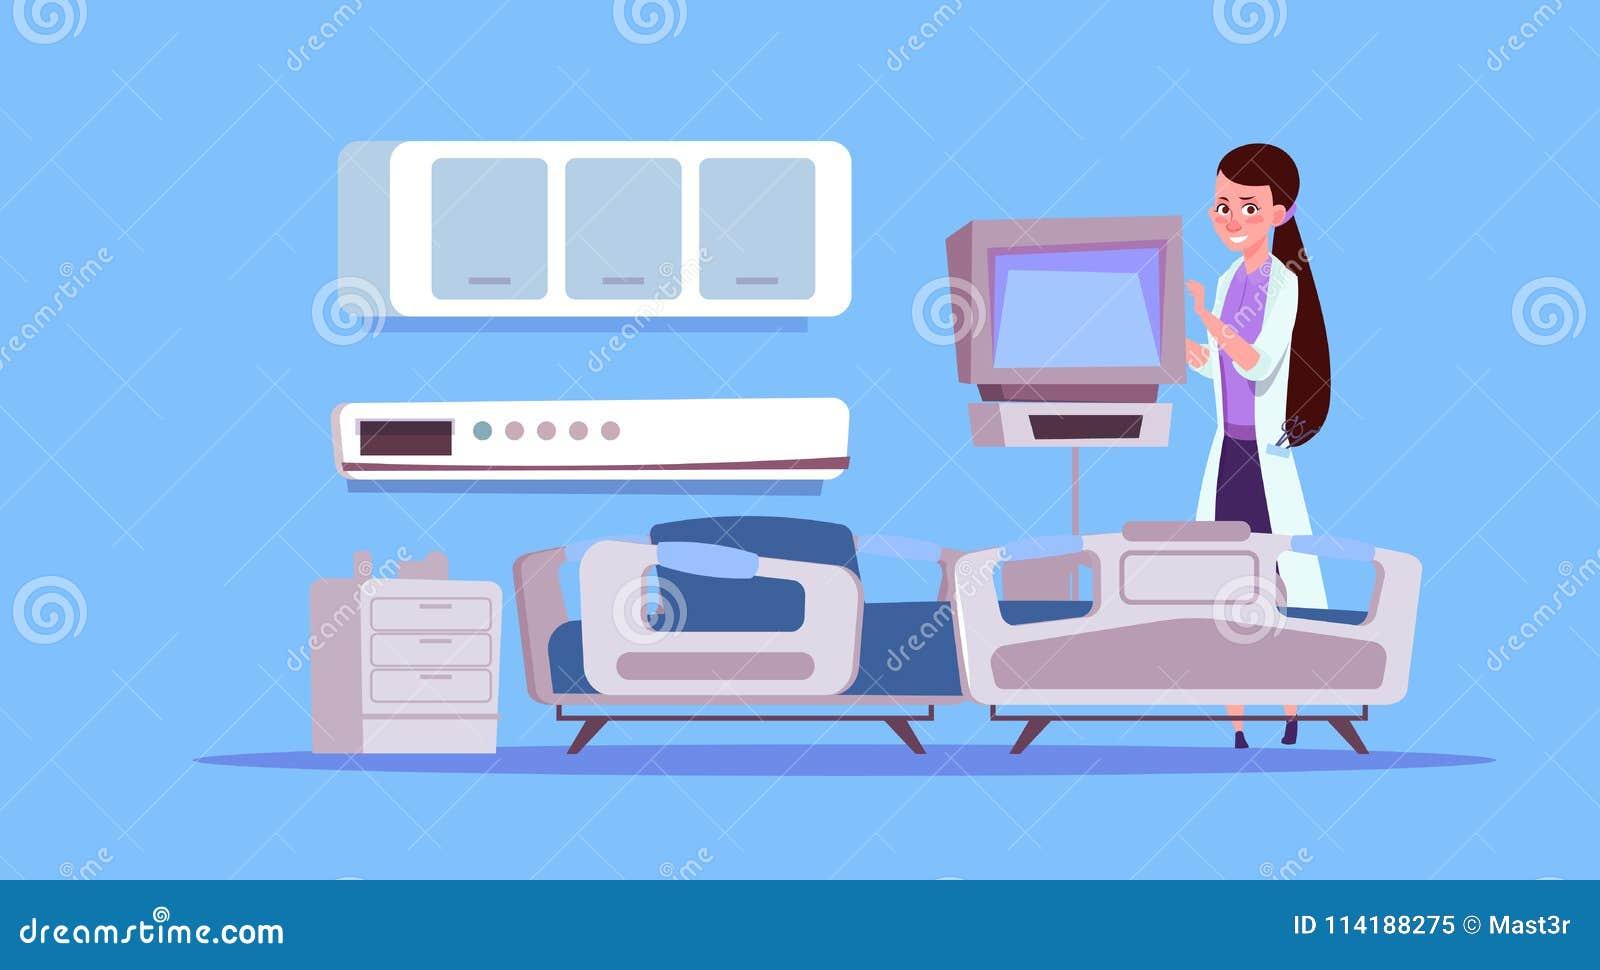 Vrouwelijke Arts Check Hospital Ward Equipment Medical Clinic Concept